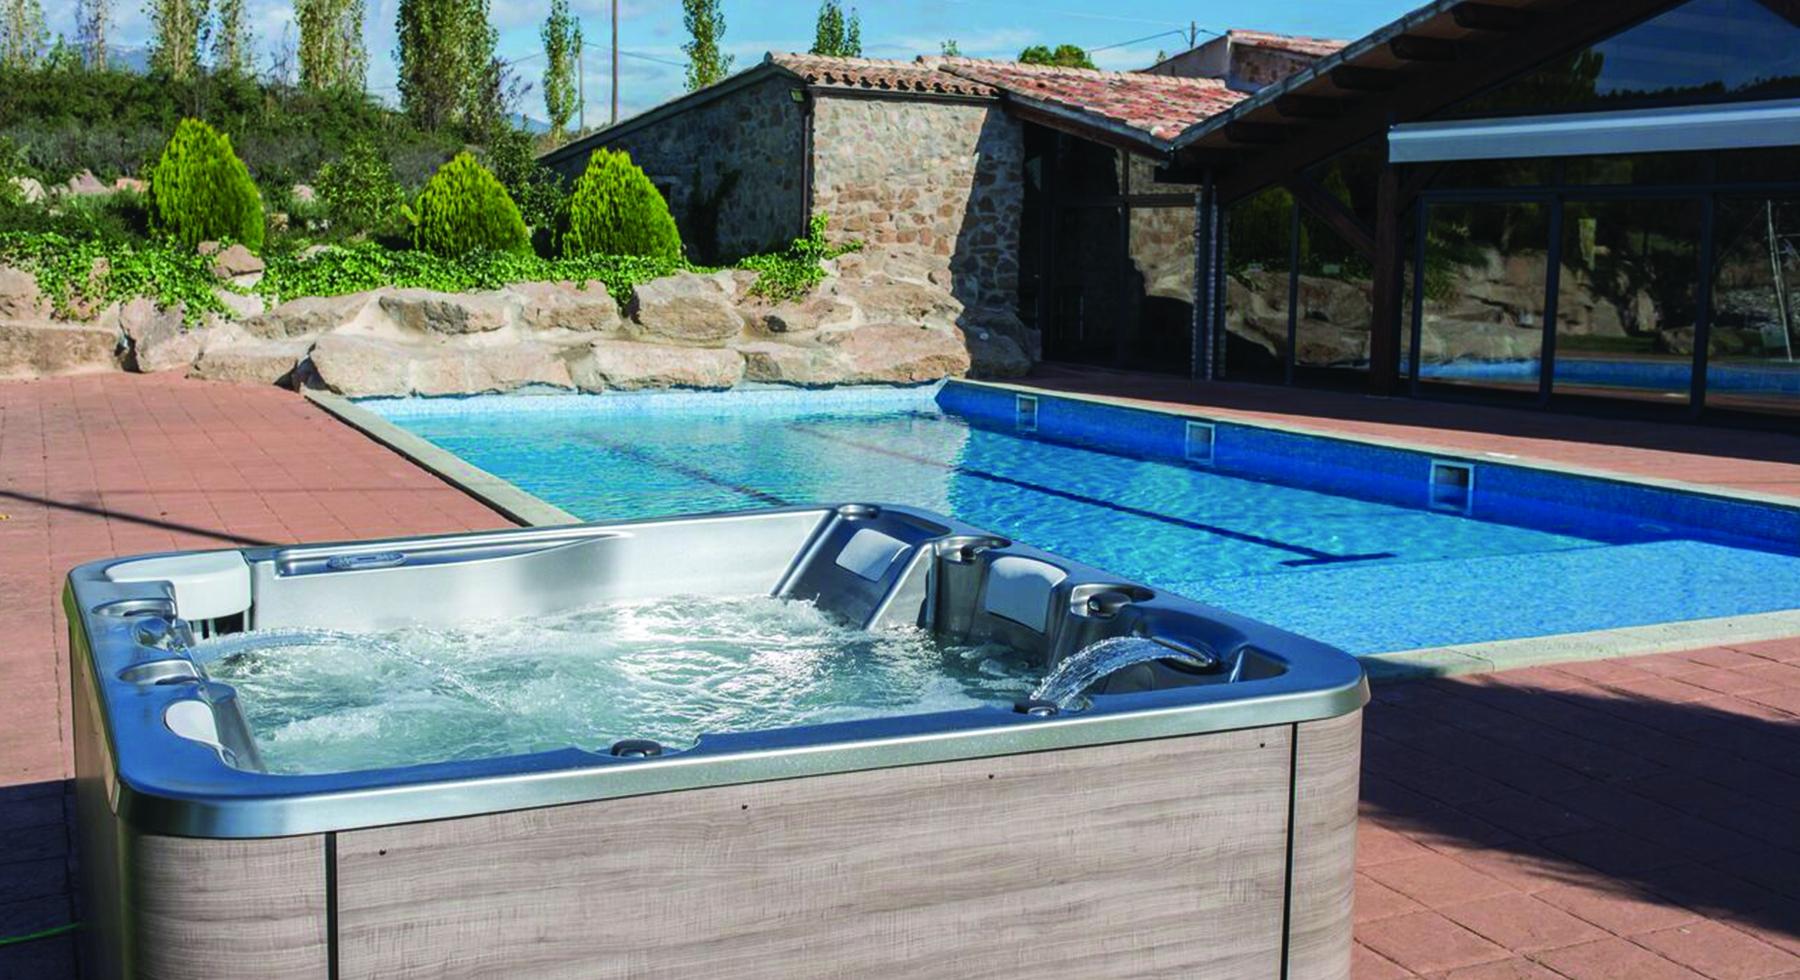 Spa Aqualife 7